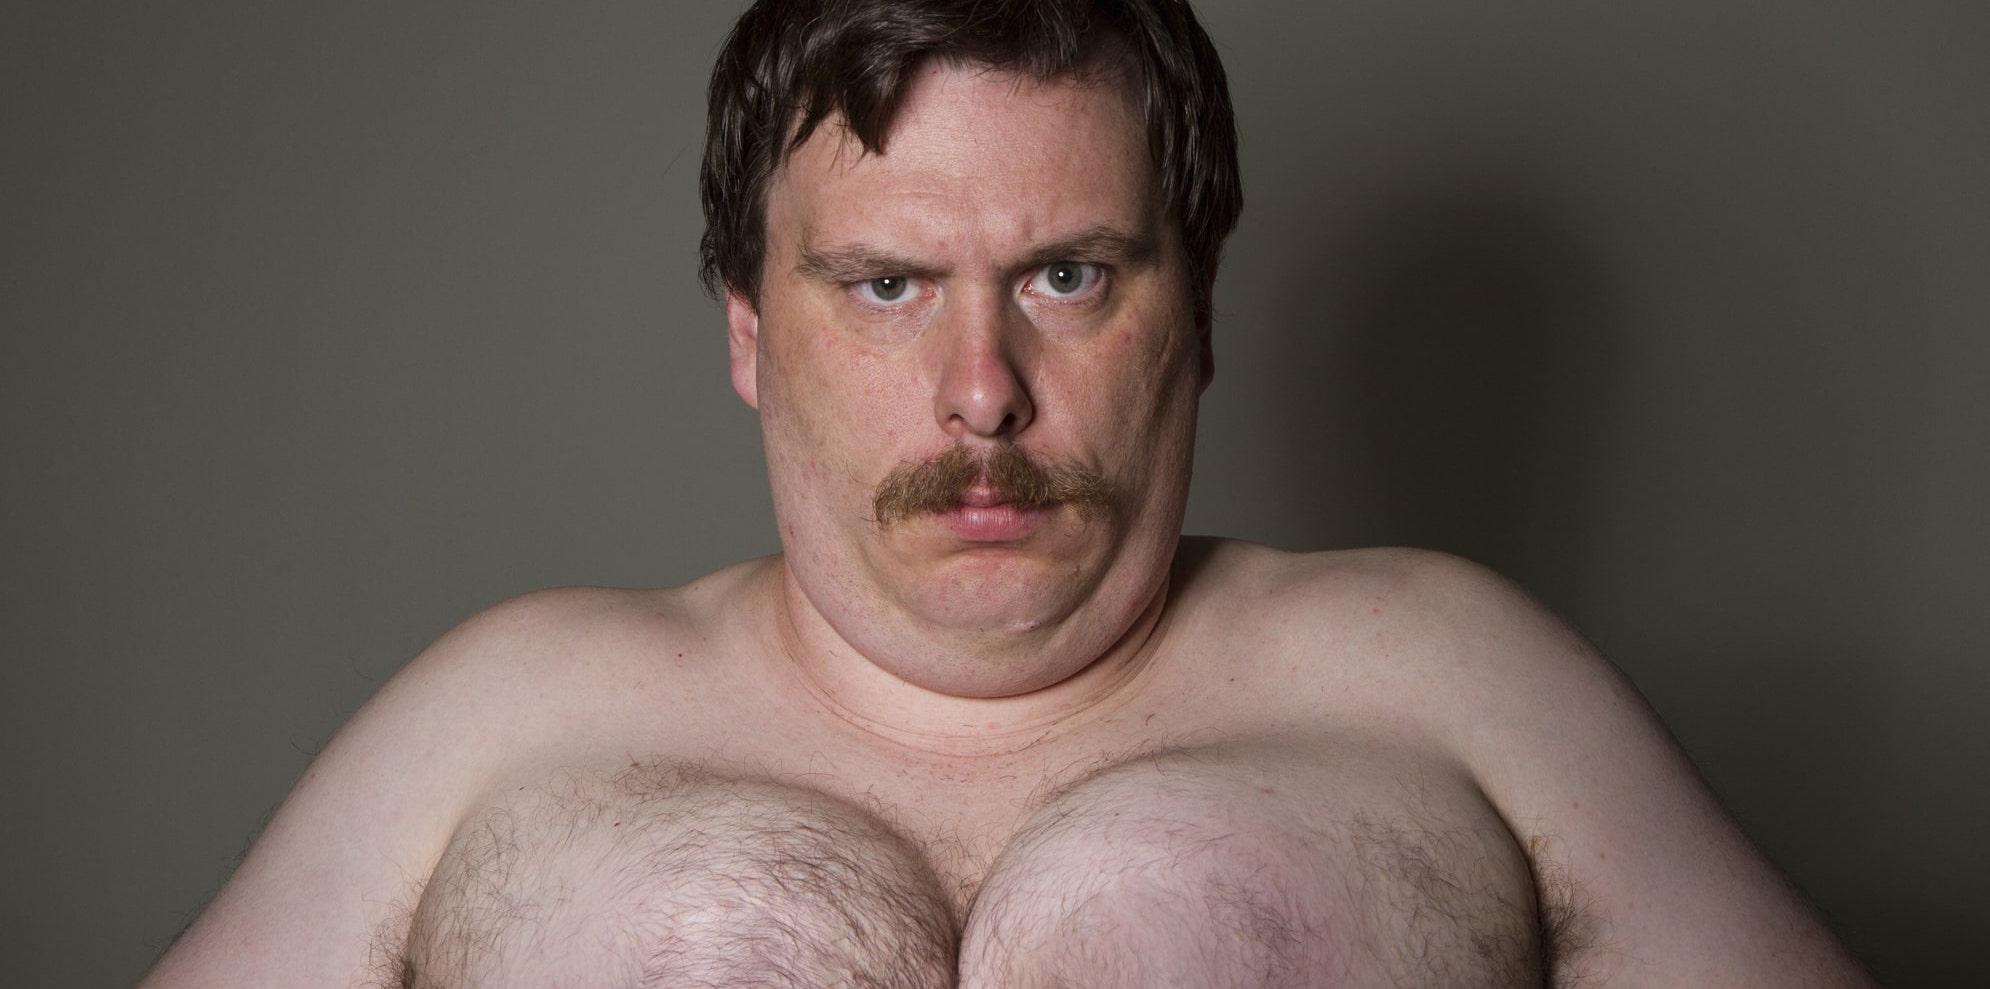 Man boob truths